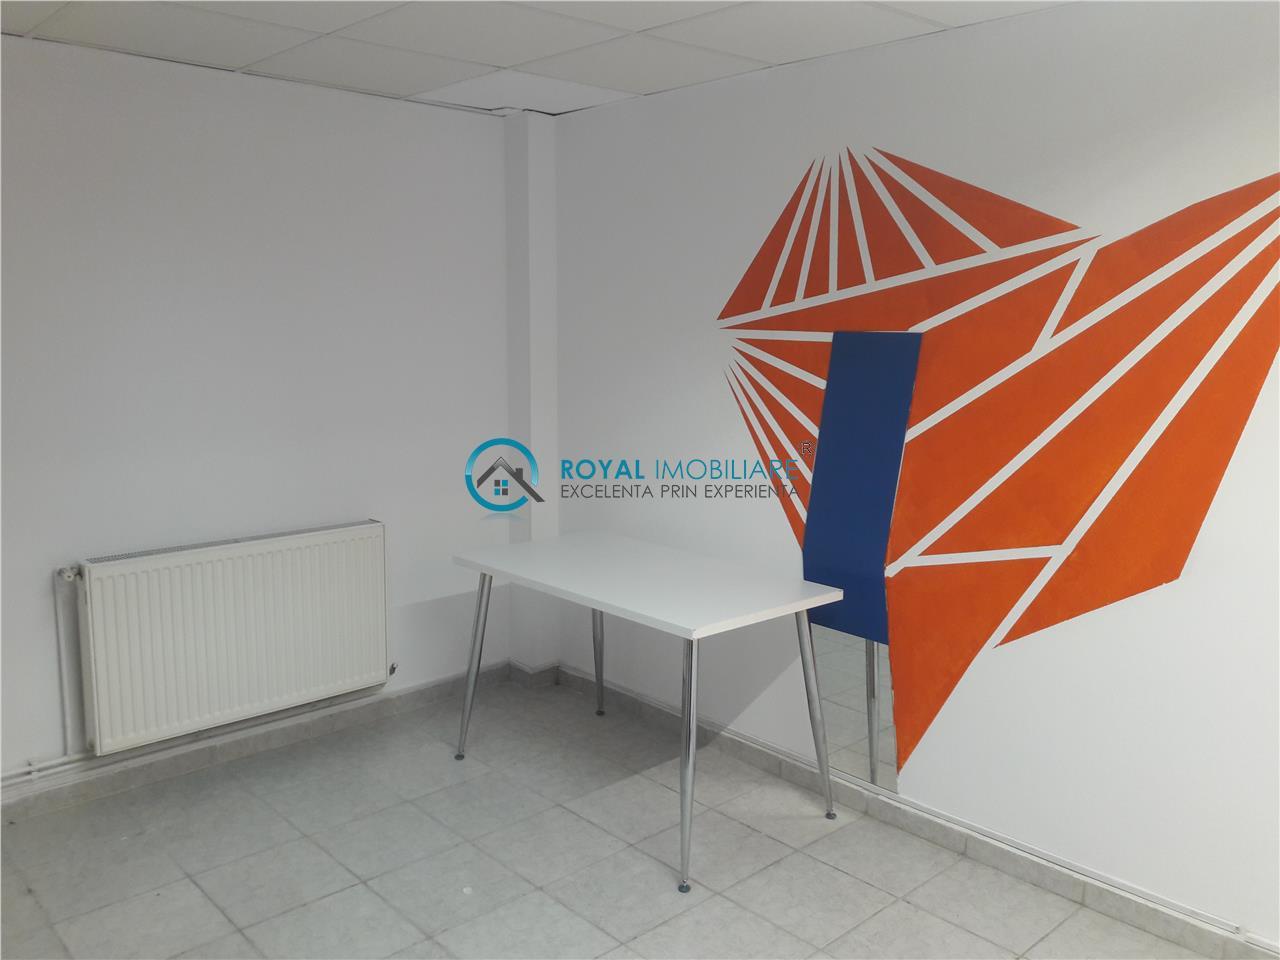 Royal Imobiliare   Inchirieri spatii comerciale zona Cantacuzino